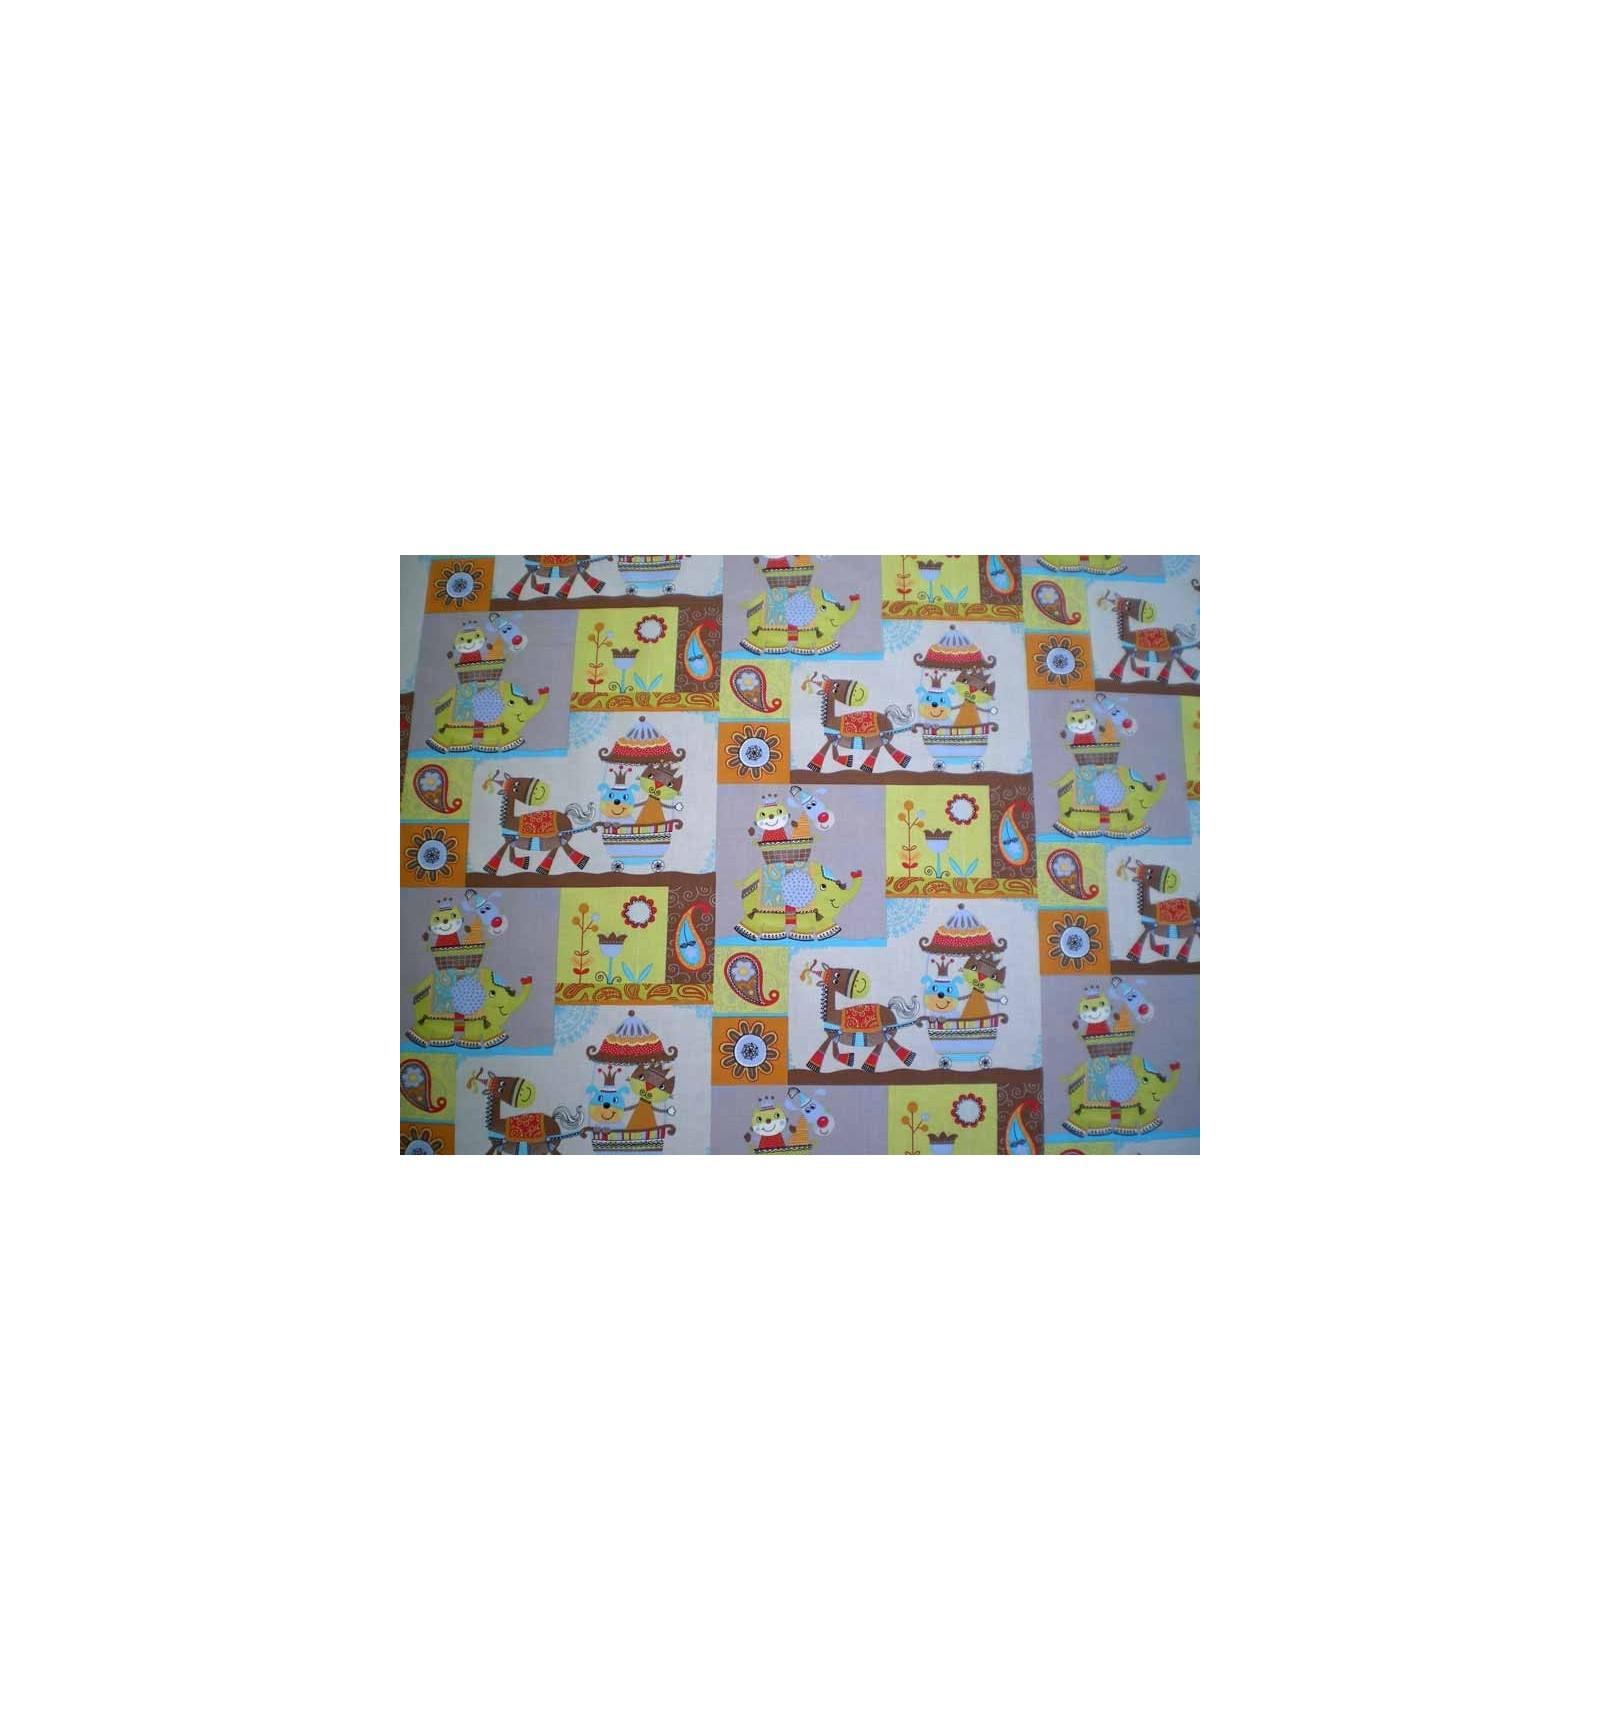 tissu imprim enfant vente en ligne de tissus pour enfants. Black Bedroom Furniture Sets. Home Design Ideas